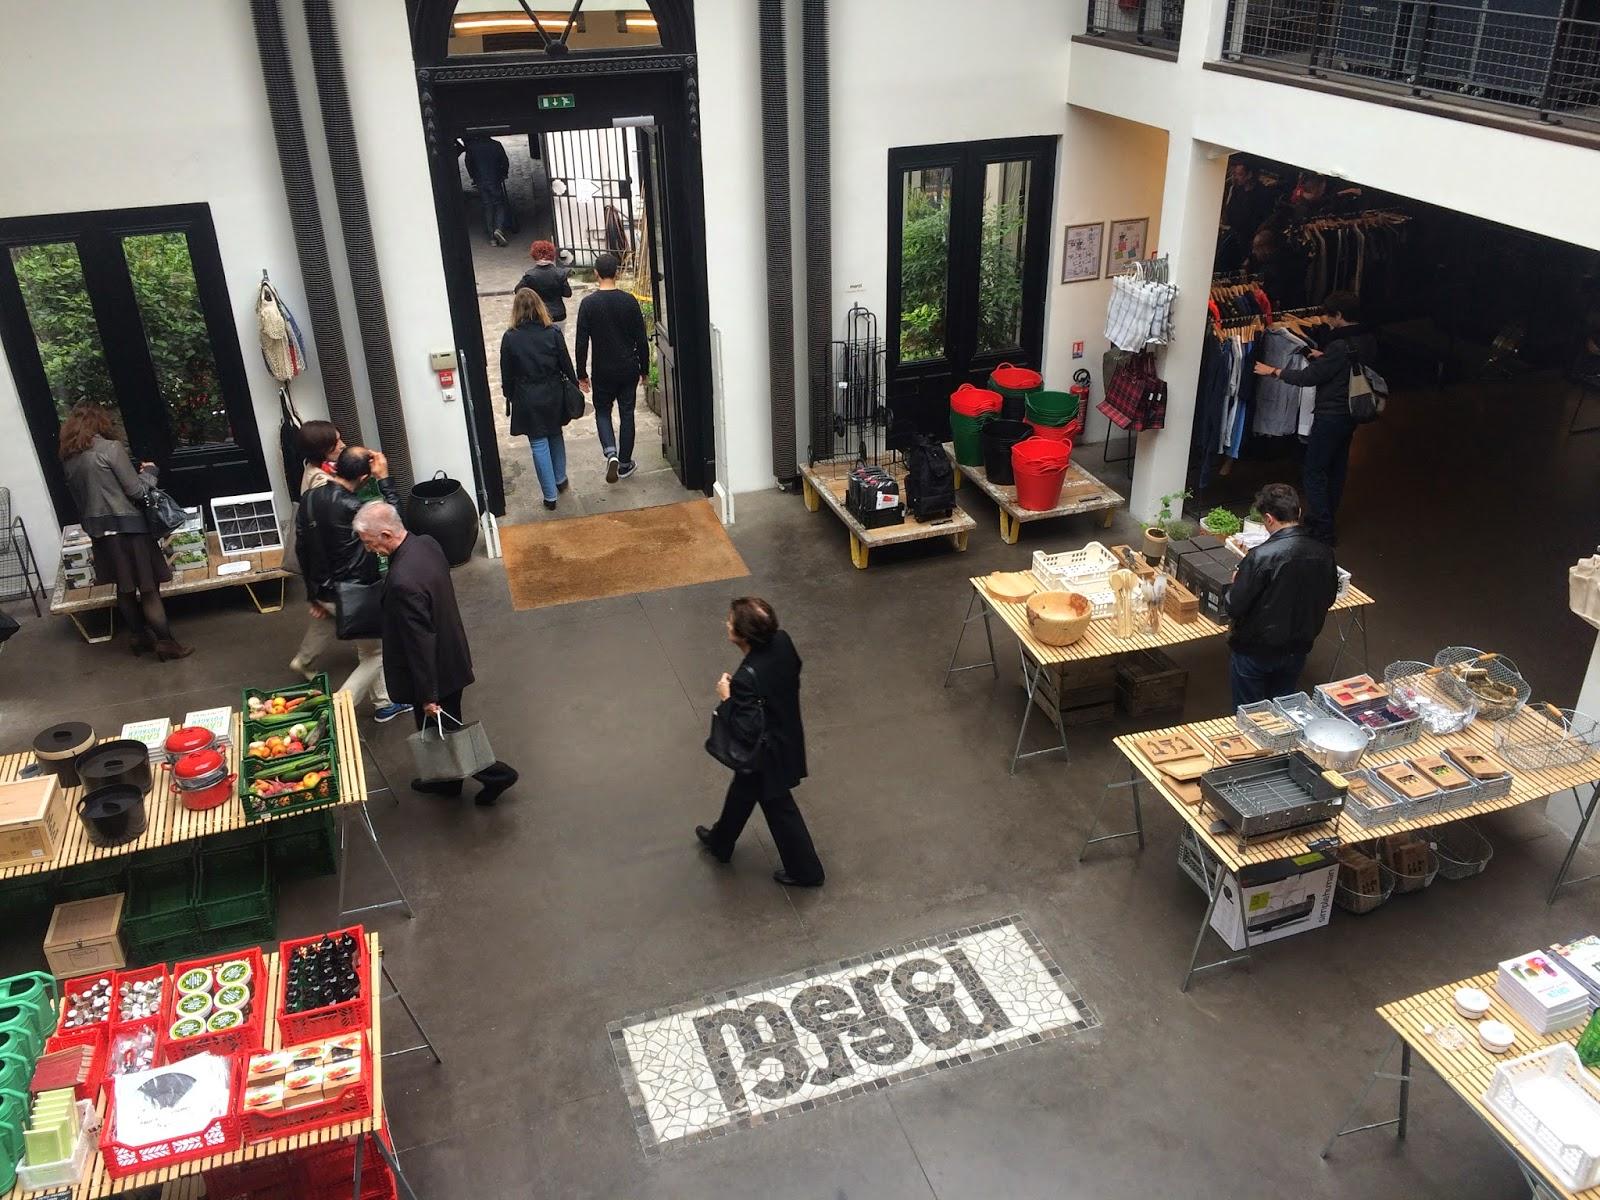 Say oui to paris may 2015 - Merci paris concept store ...